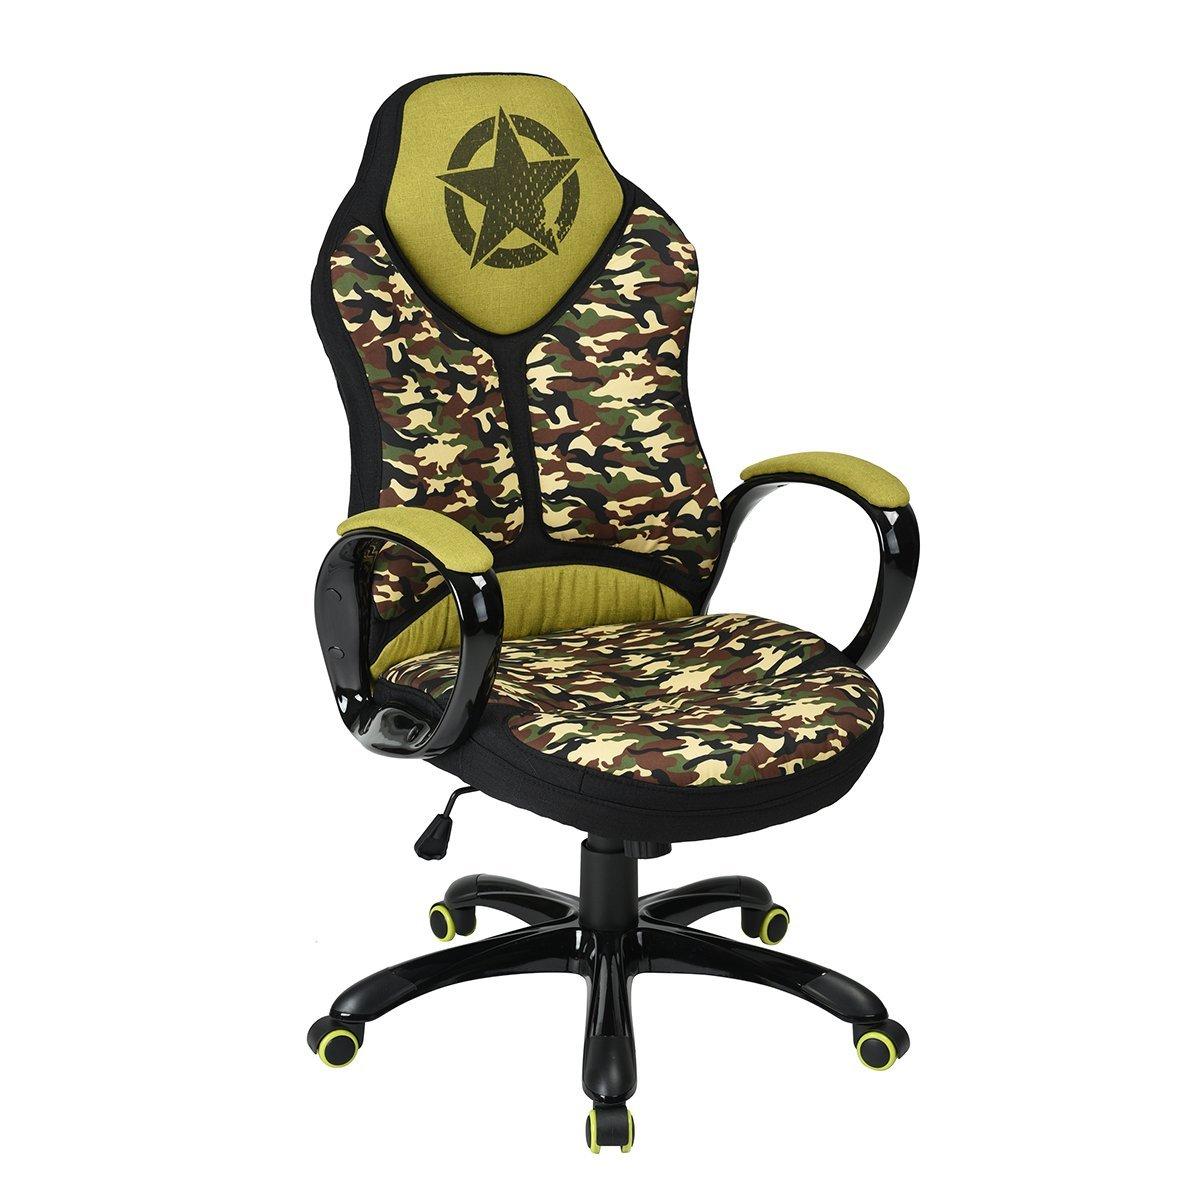 Office desk chair Big office chair Ergonomic office desk chair Racing car chair High Back Racing Car Style Gaming chair Study chair Student chair